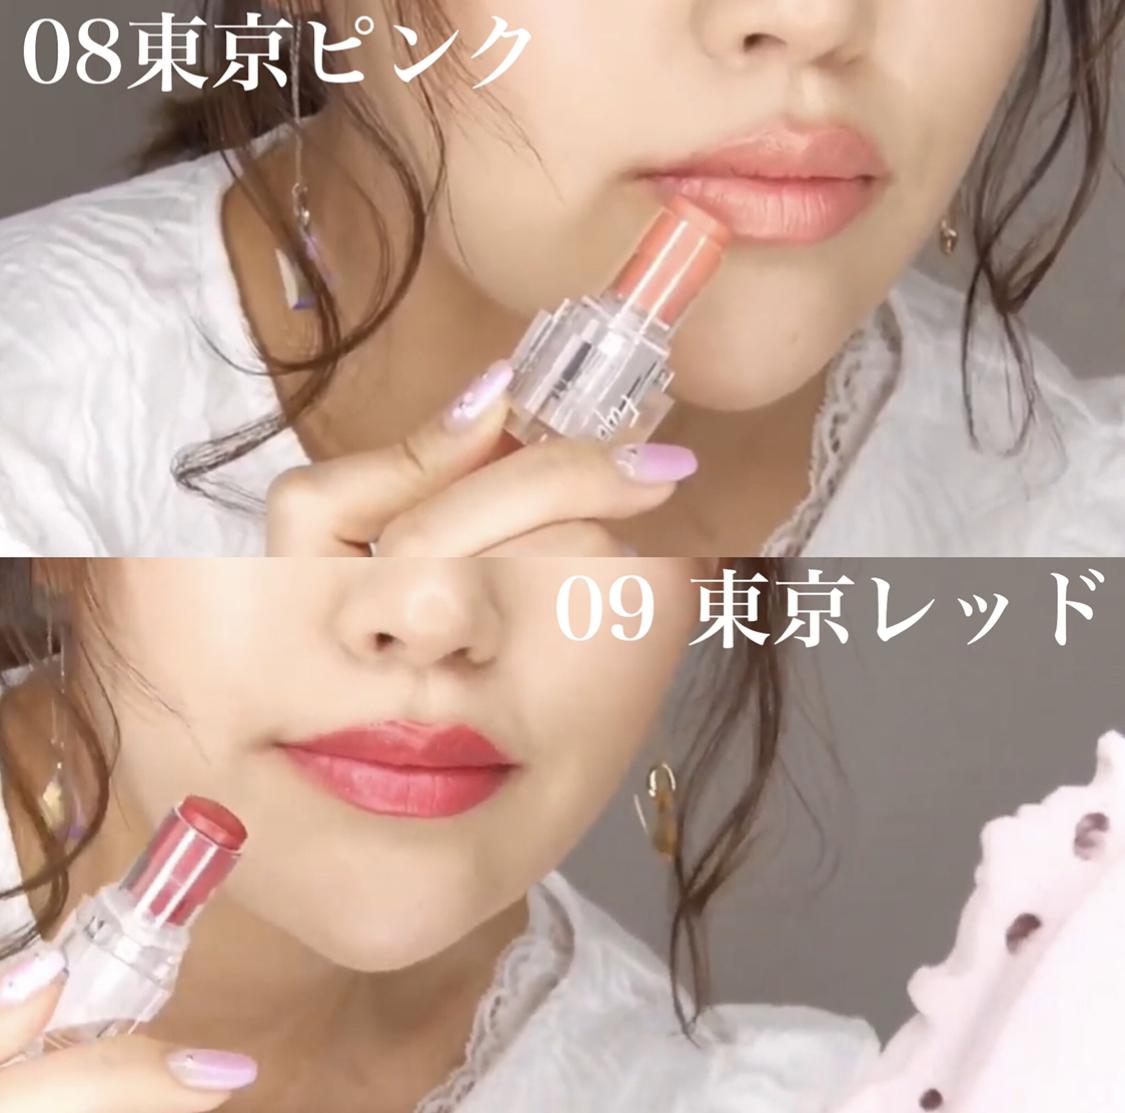 『Fujiko』の新作アイシャドウ&リップ新色! 美容家立花ゆうりが5/30発売の新作を全部お試し!!_3